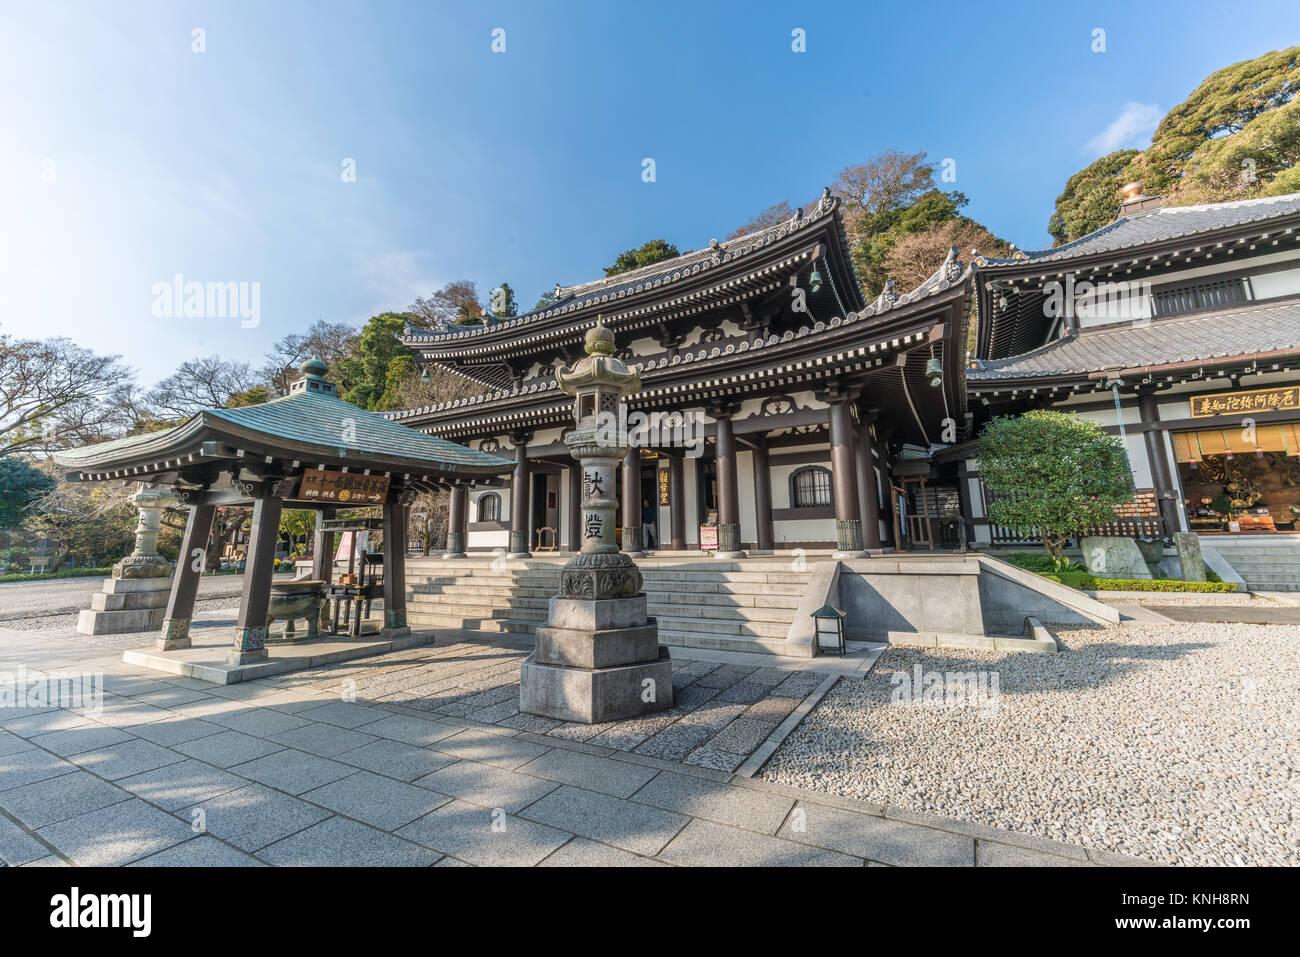 Kamakura, Kanagawa Prefecture, Japan - November 16, 2017 - Haze-dera temple or Hase-kannon temple. Jokoro (Incense - Stock Image